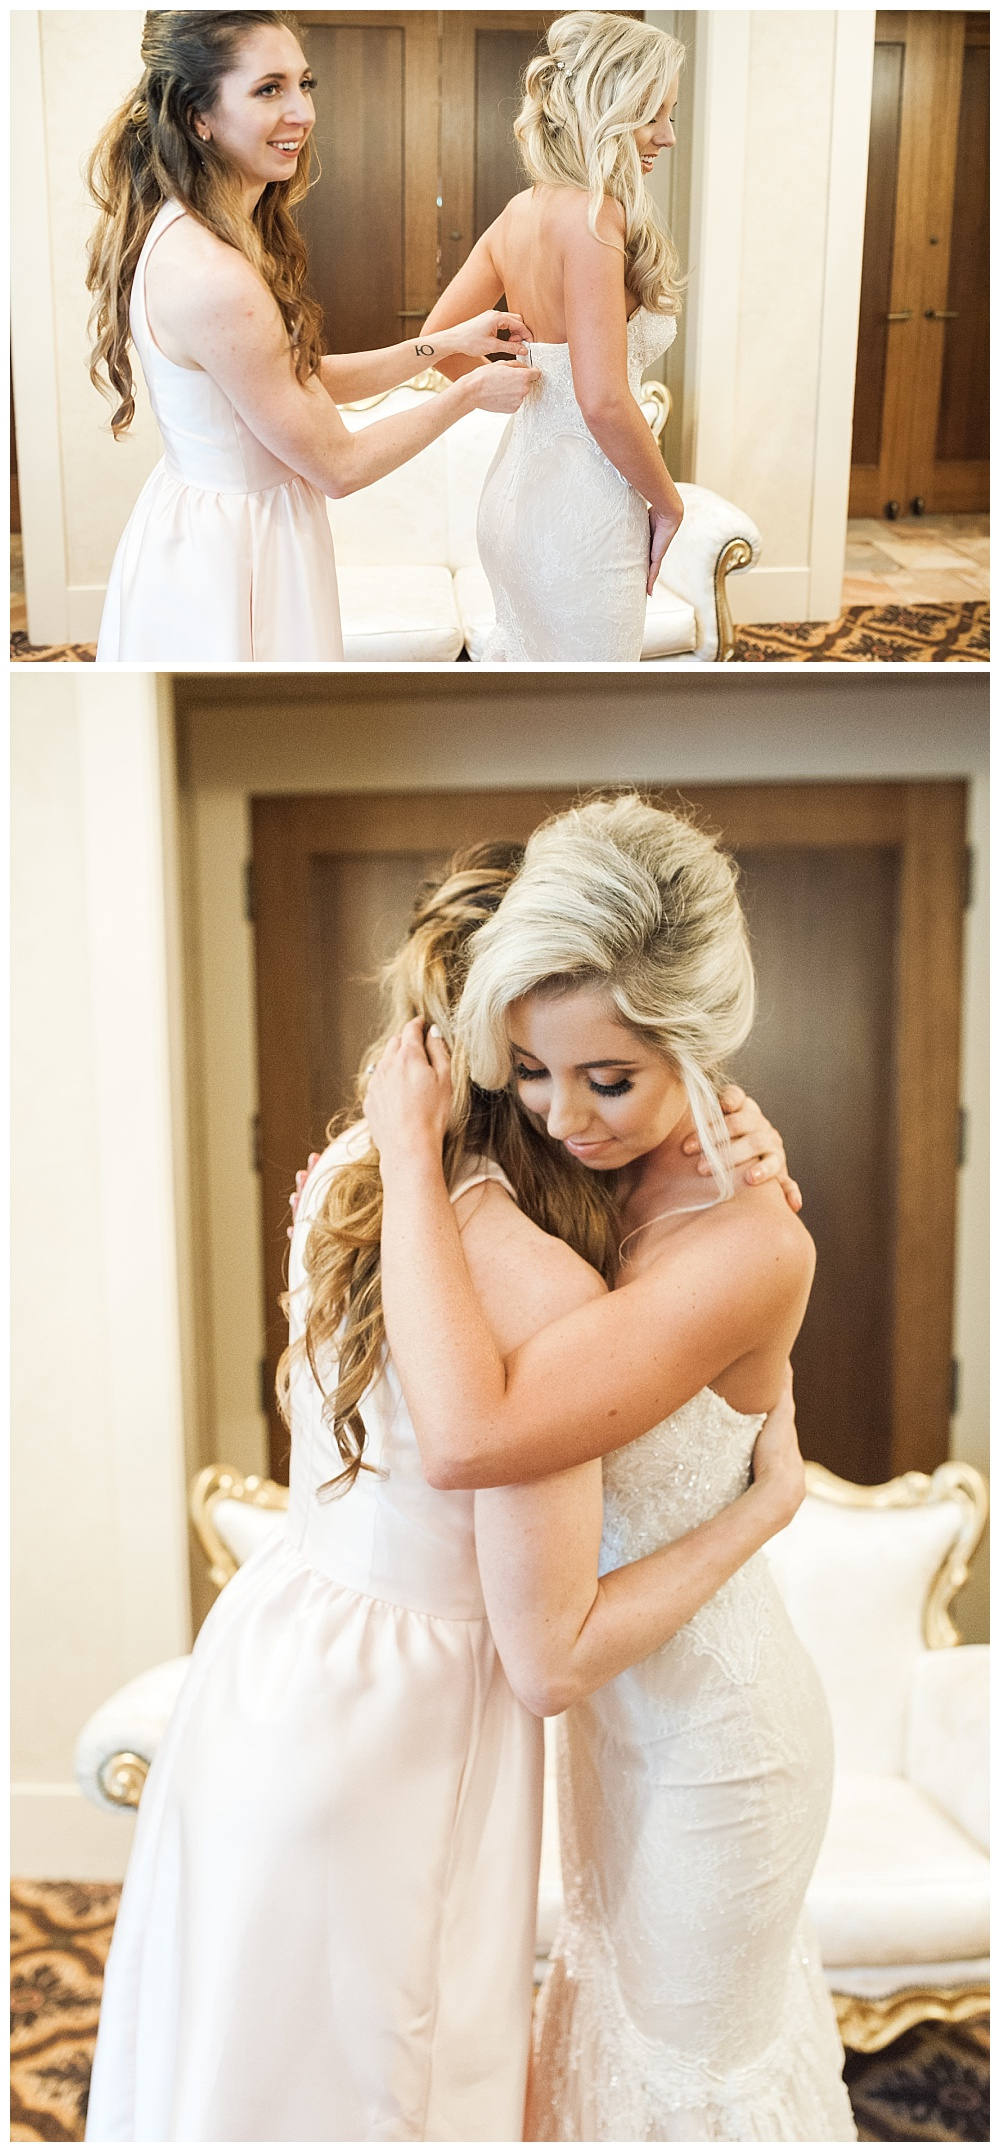 Stephanie Marie Photography TPC Deere Run Quad Cities Iowa City Wedding Photographer Ben Erin Dittmer_0018.jpg